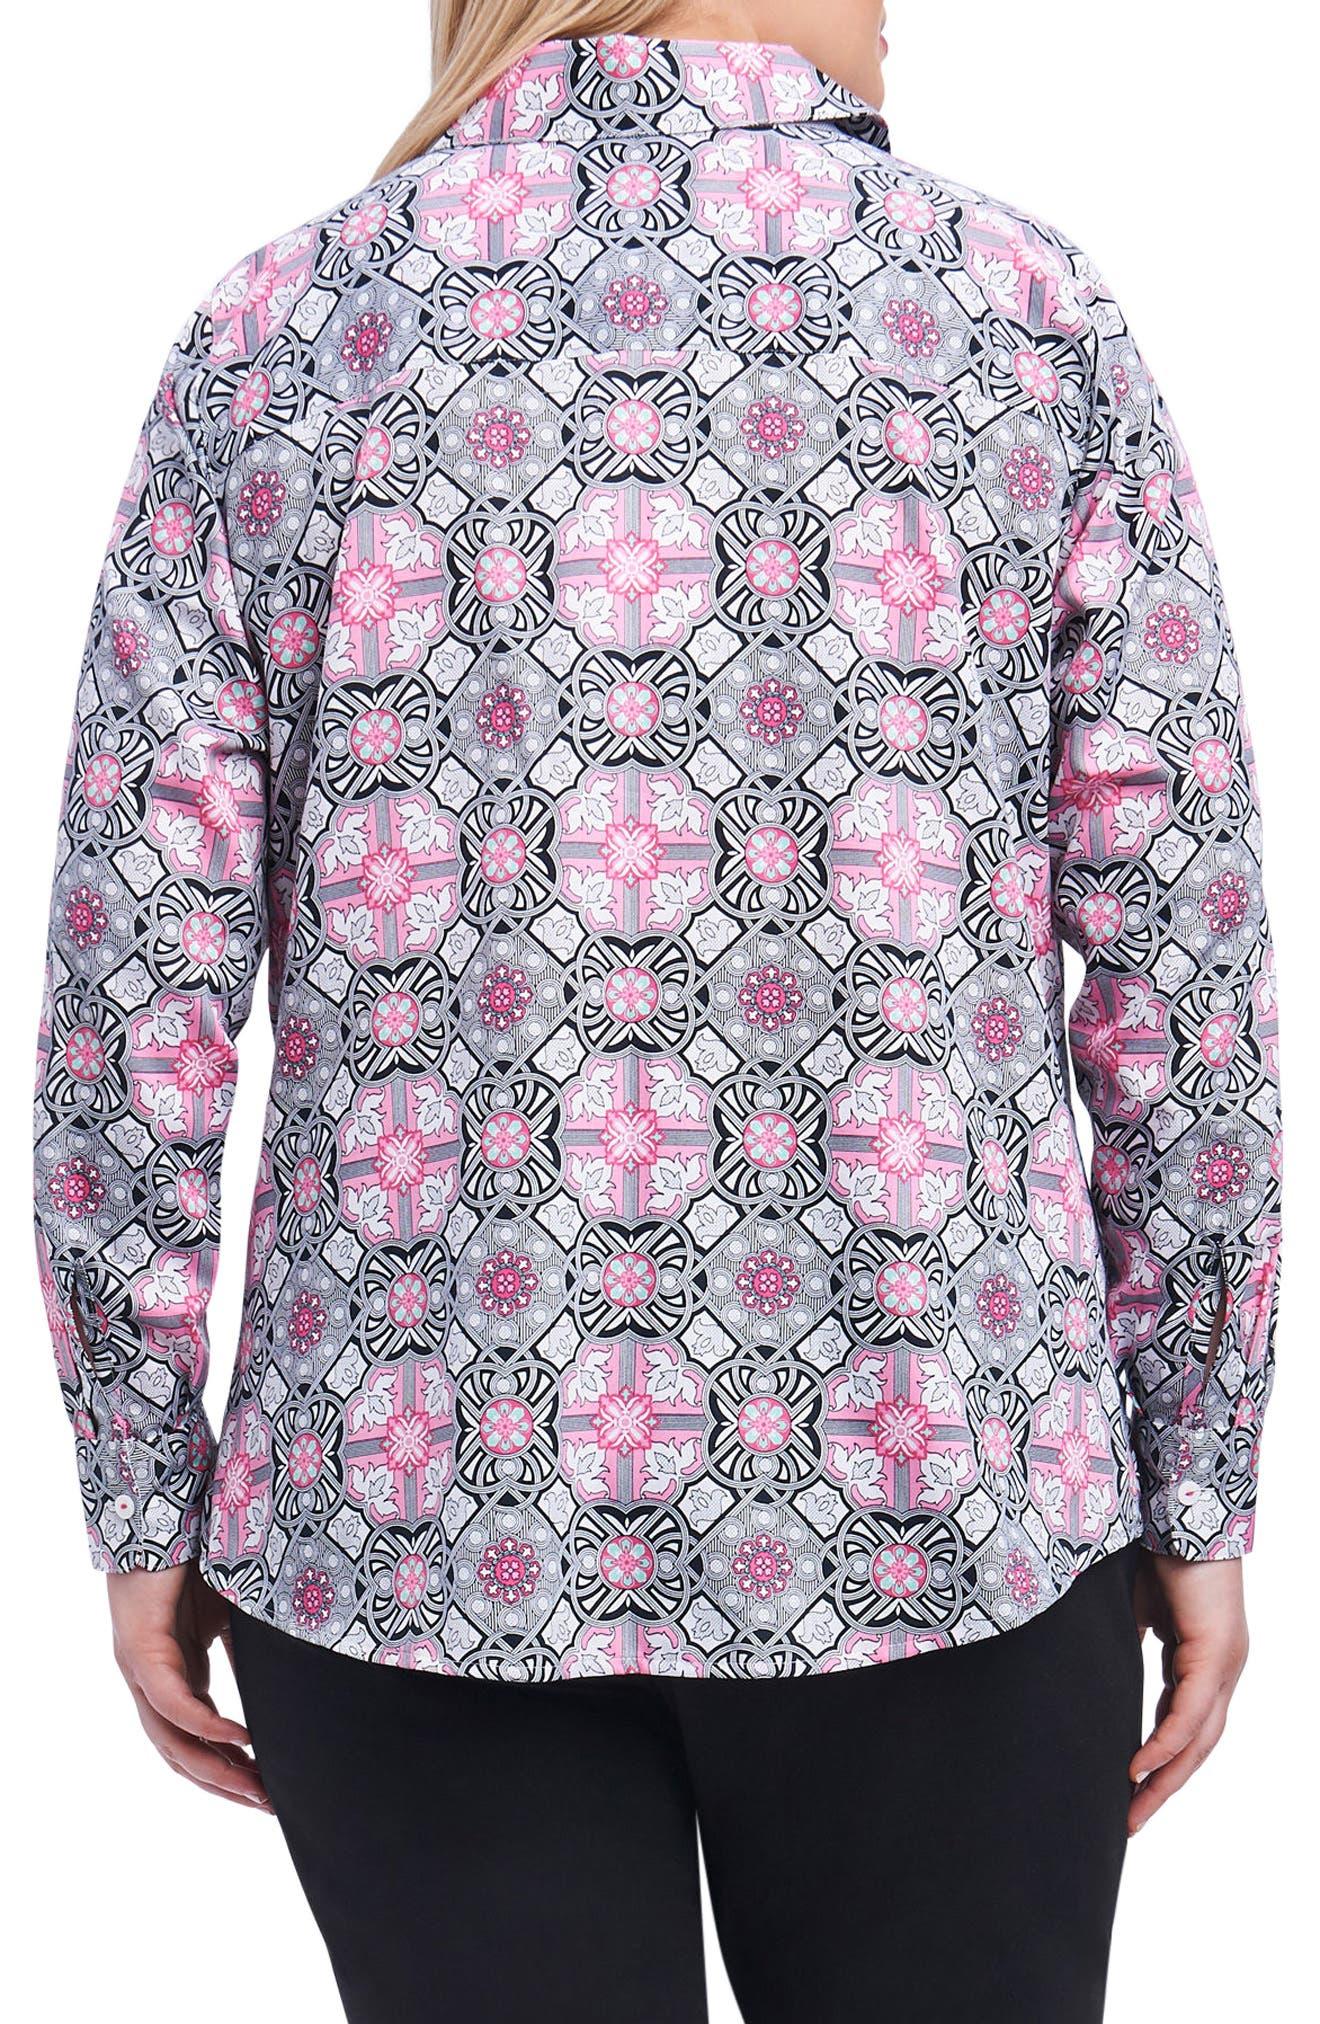 Ava Mosaic Tile Shirt,                             Alternate thumbnail 2, color,